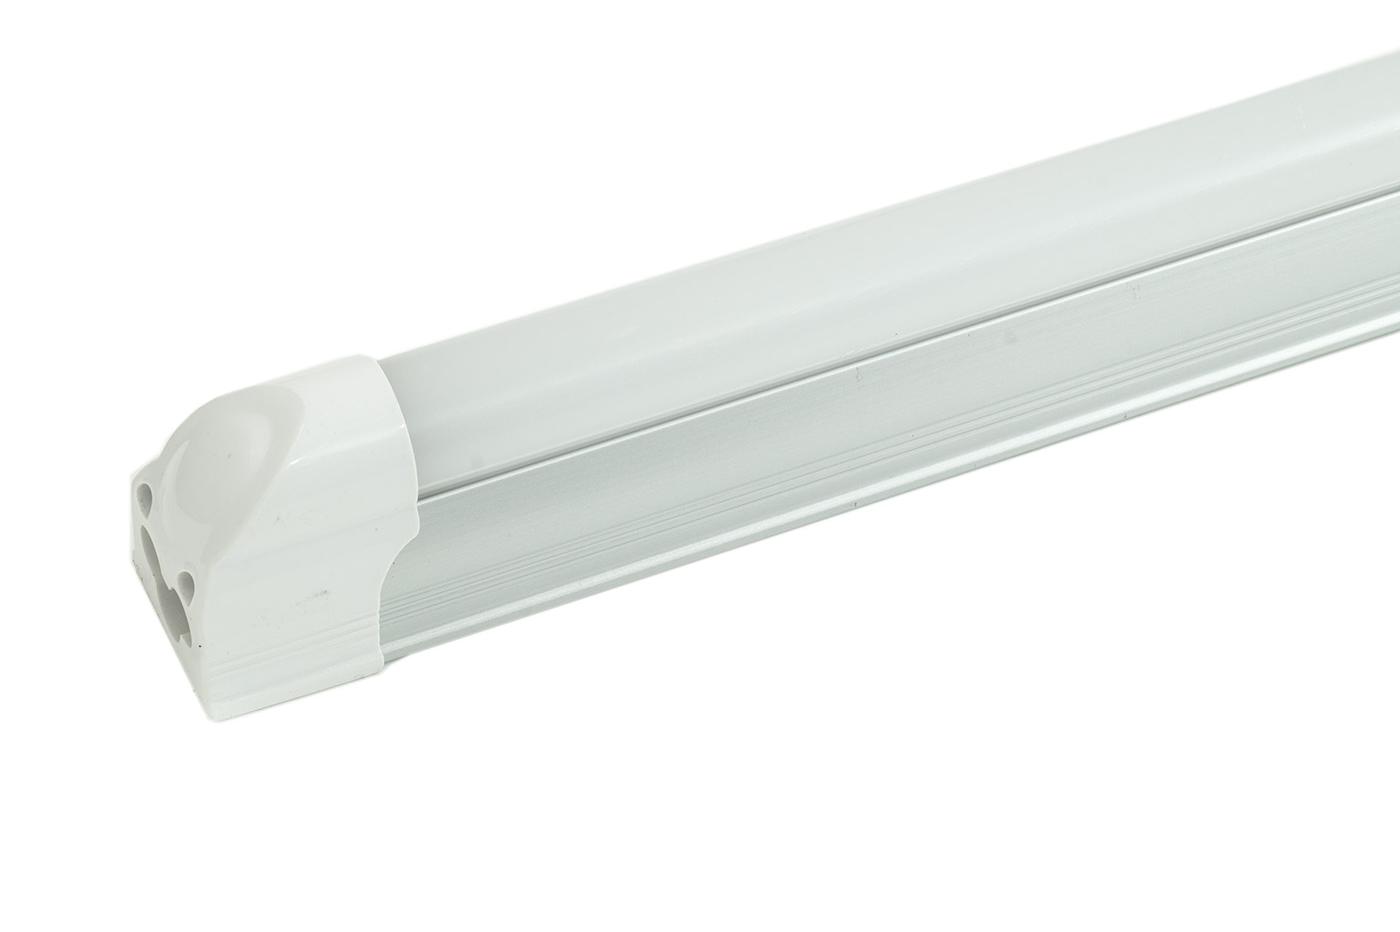 Plafoniere Neon Led : Neon led plafoniera t attacco w watt luce calda fredda ck